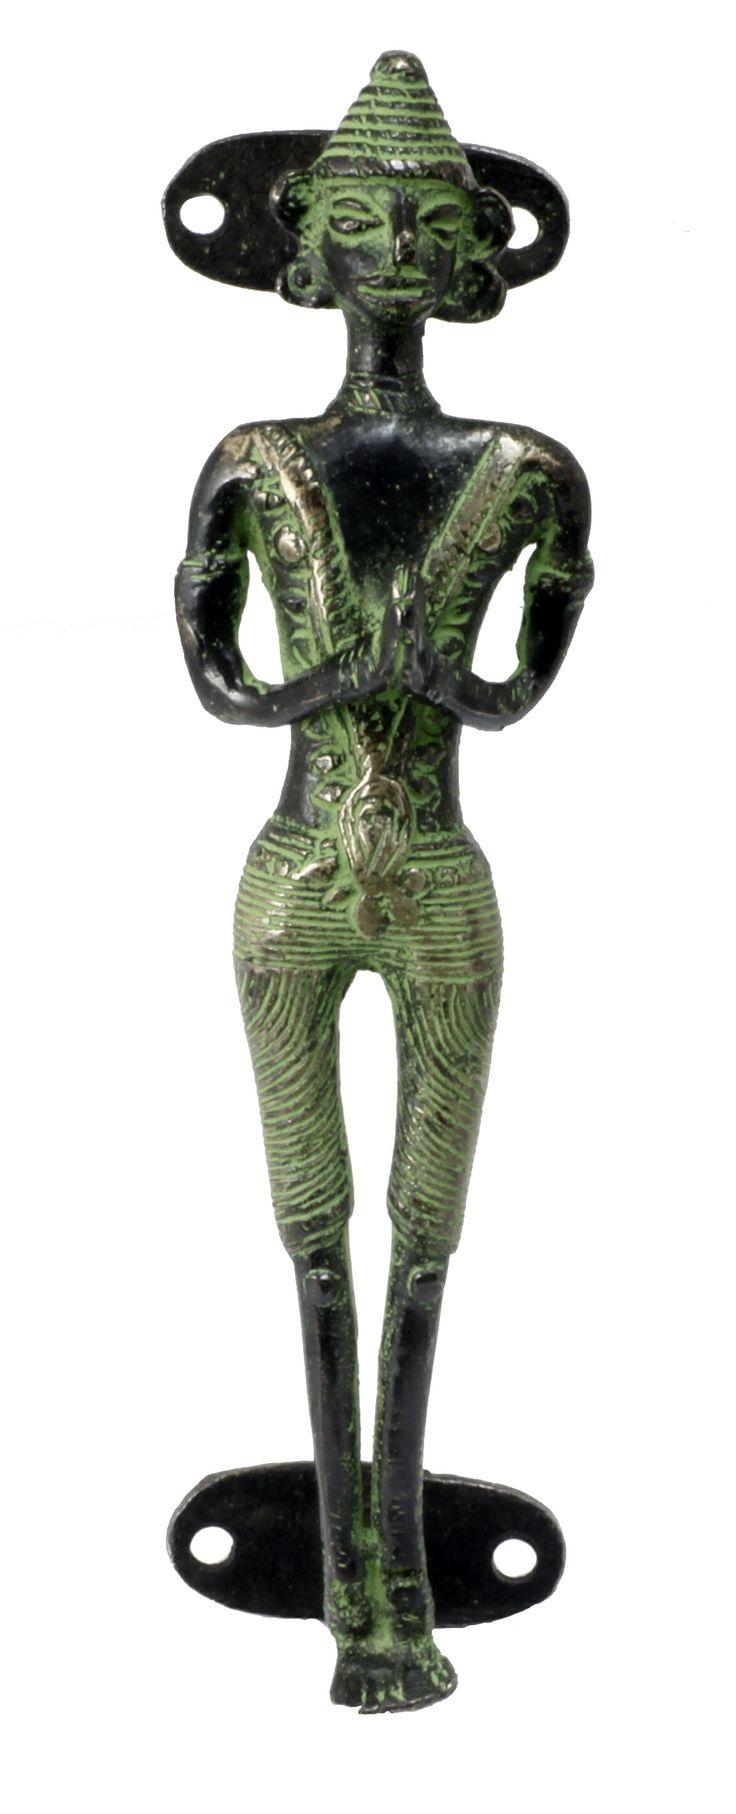 Temple Figurine- Indian Pulls & Knobs #motherofpearl #hardware #MOP #knobs #homdeco #renovation #knockers